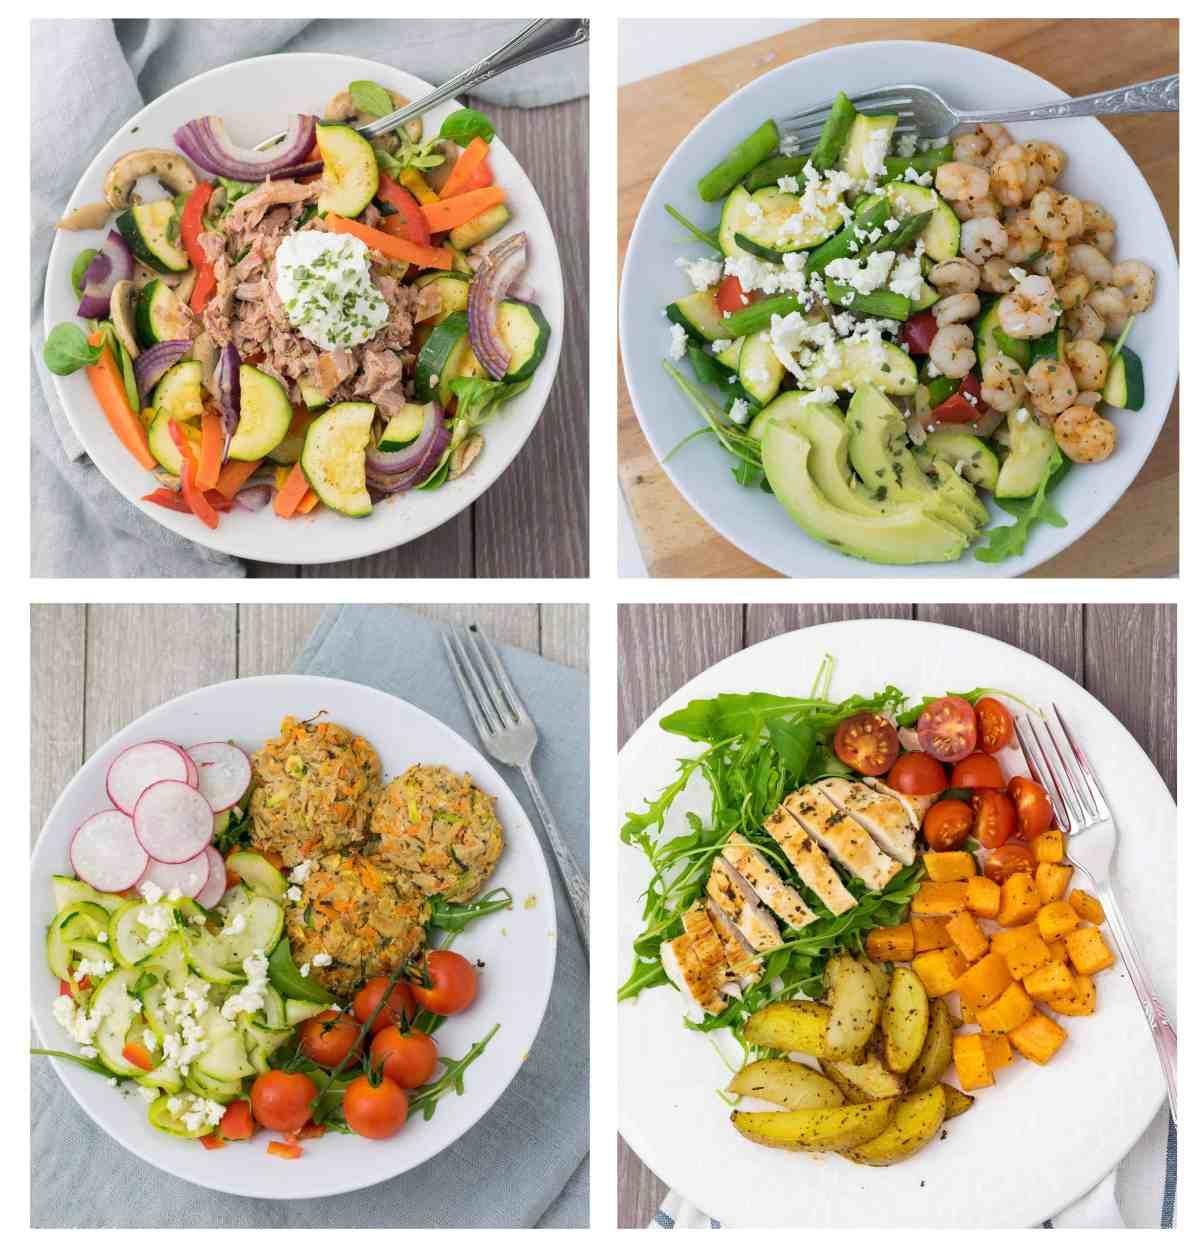 Dinner bowls 2